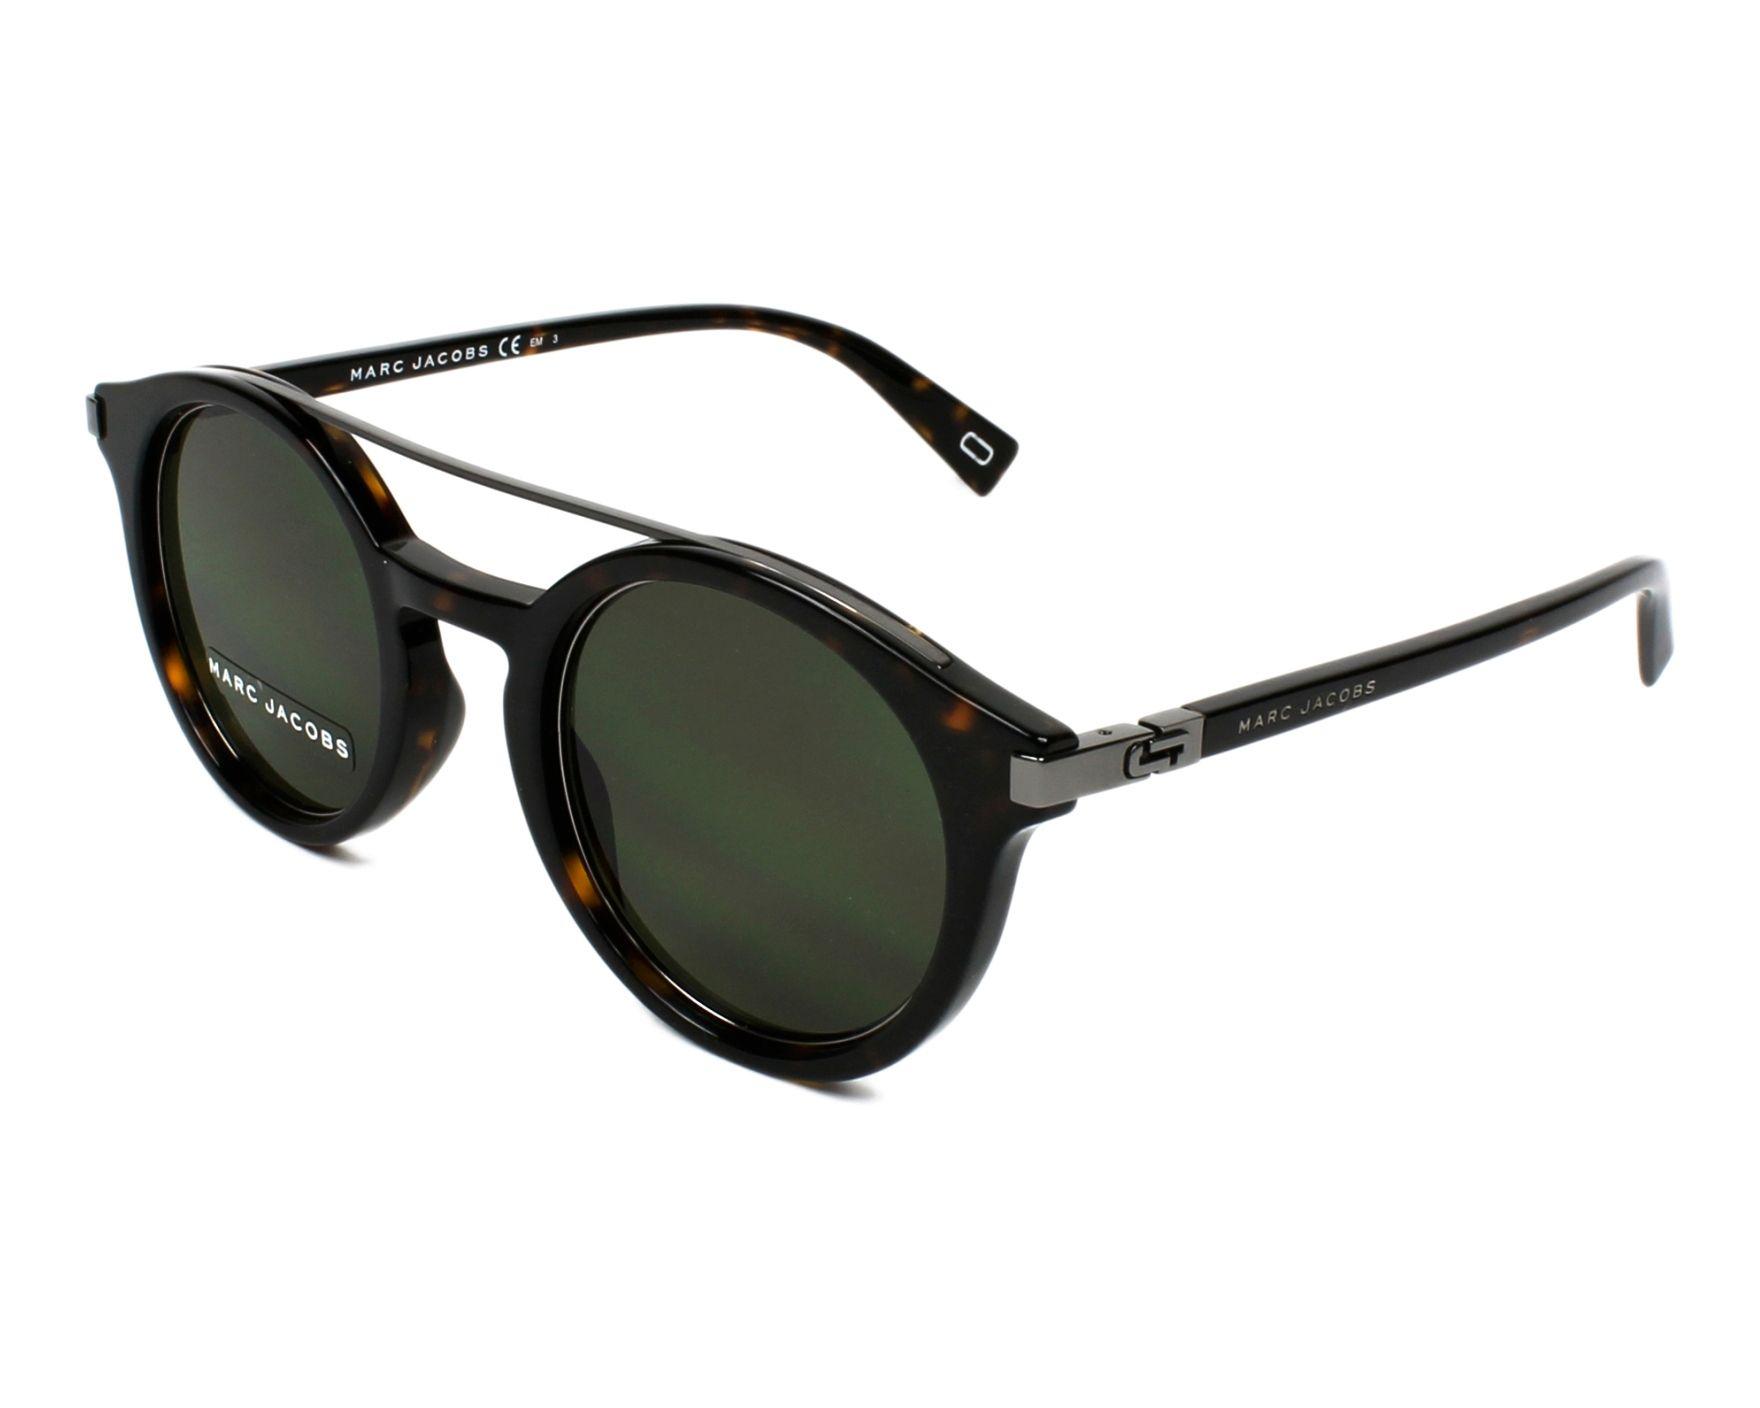 3f6dcf39da164f Sunglasses Marc Jacobs MARC-173-S 086 QT - Havana Gun profile view